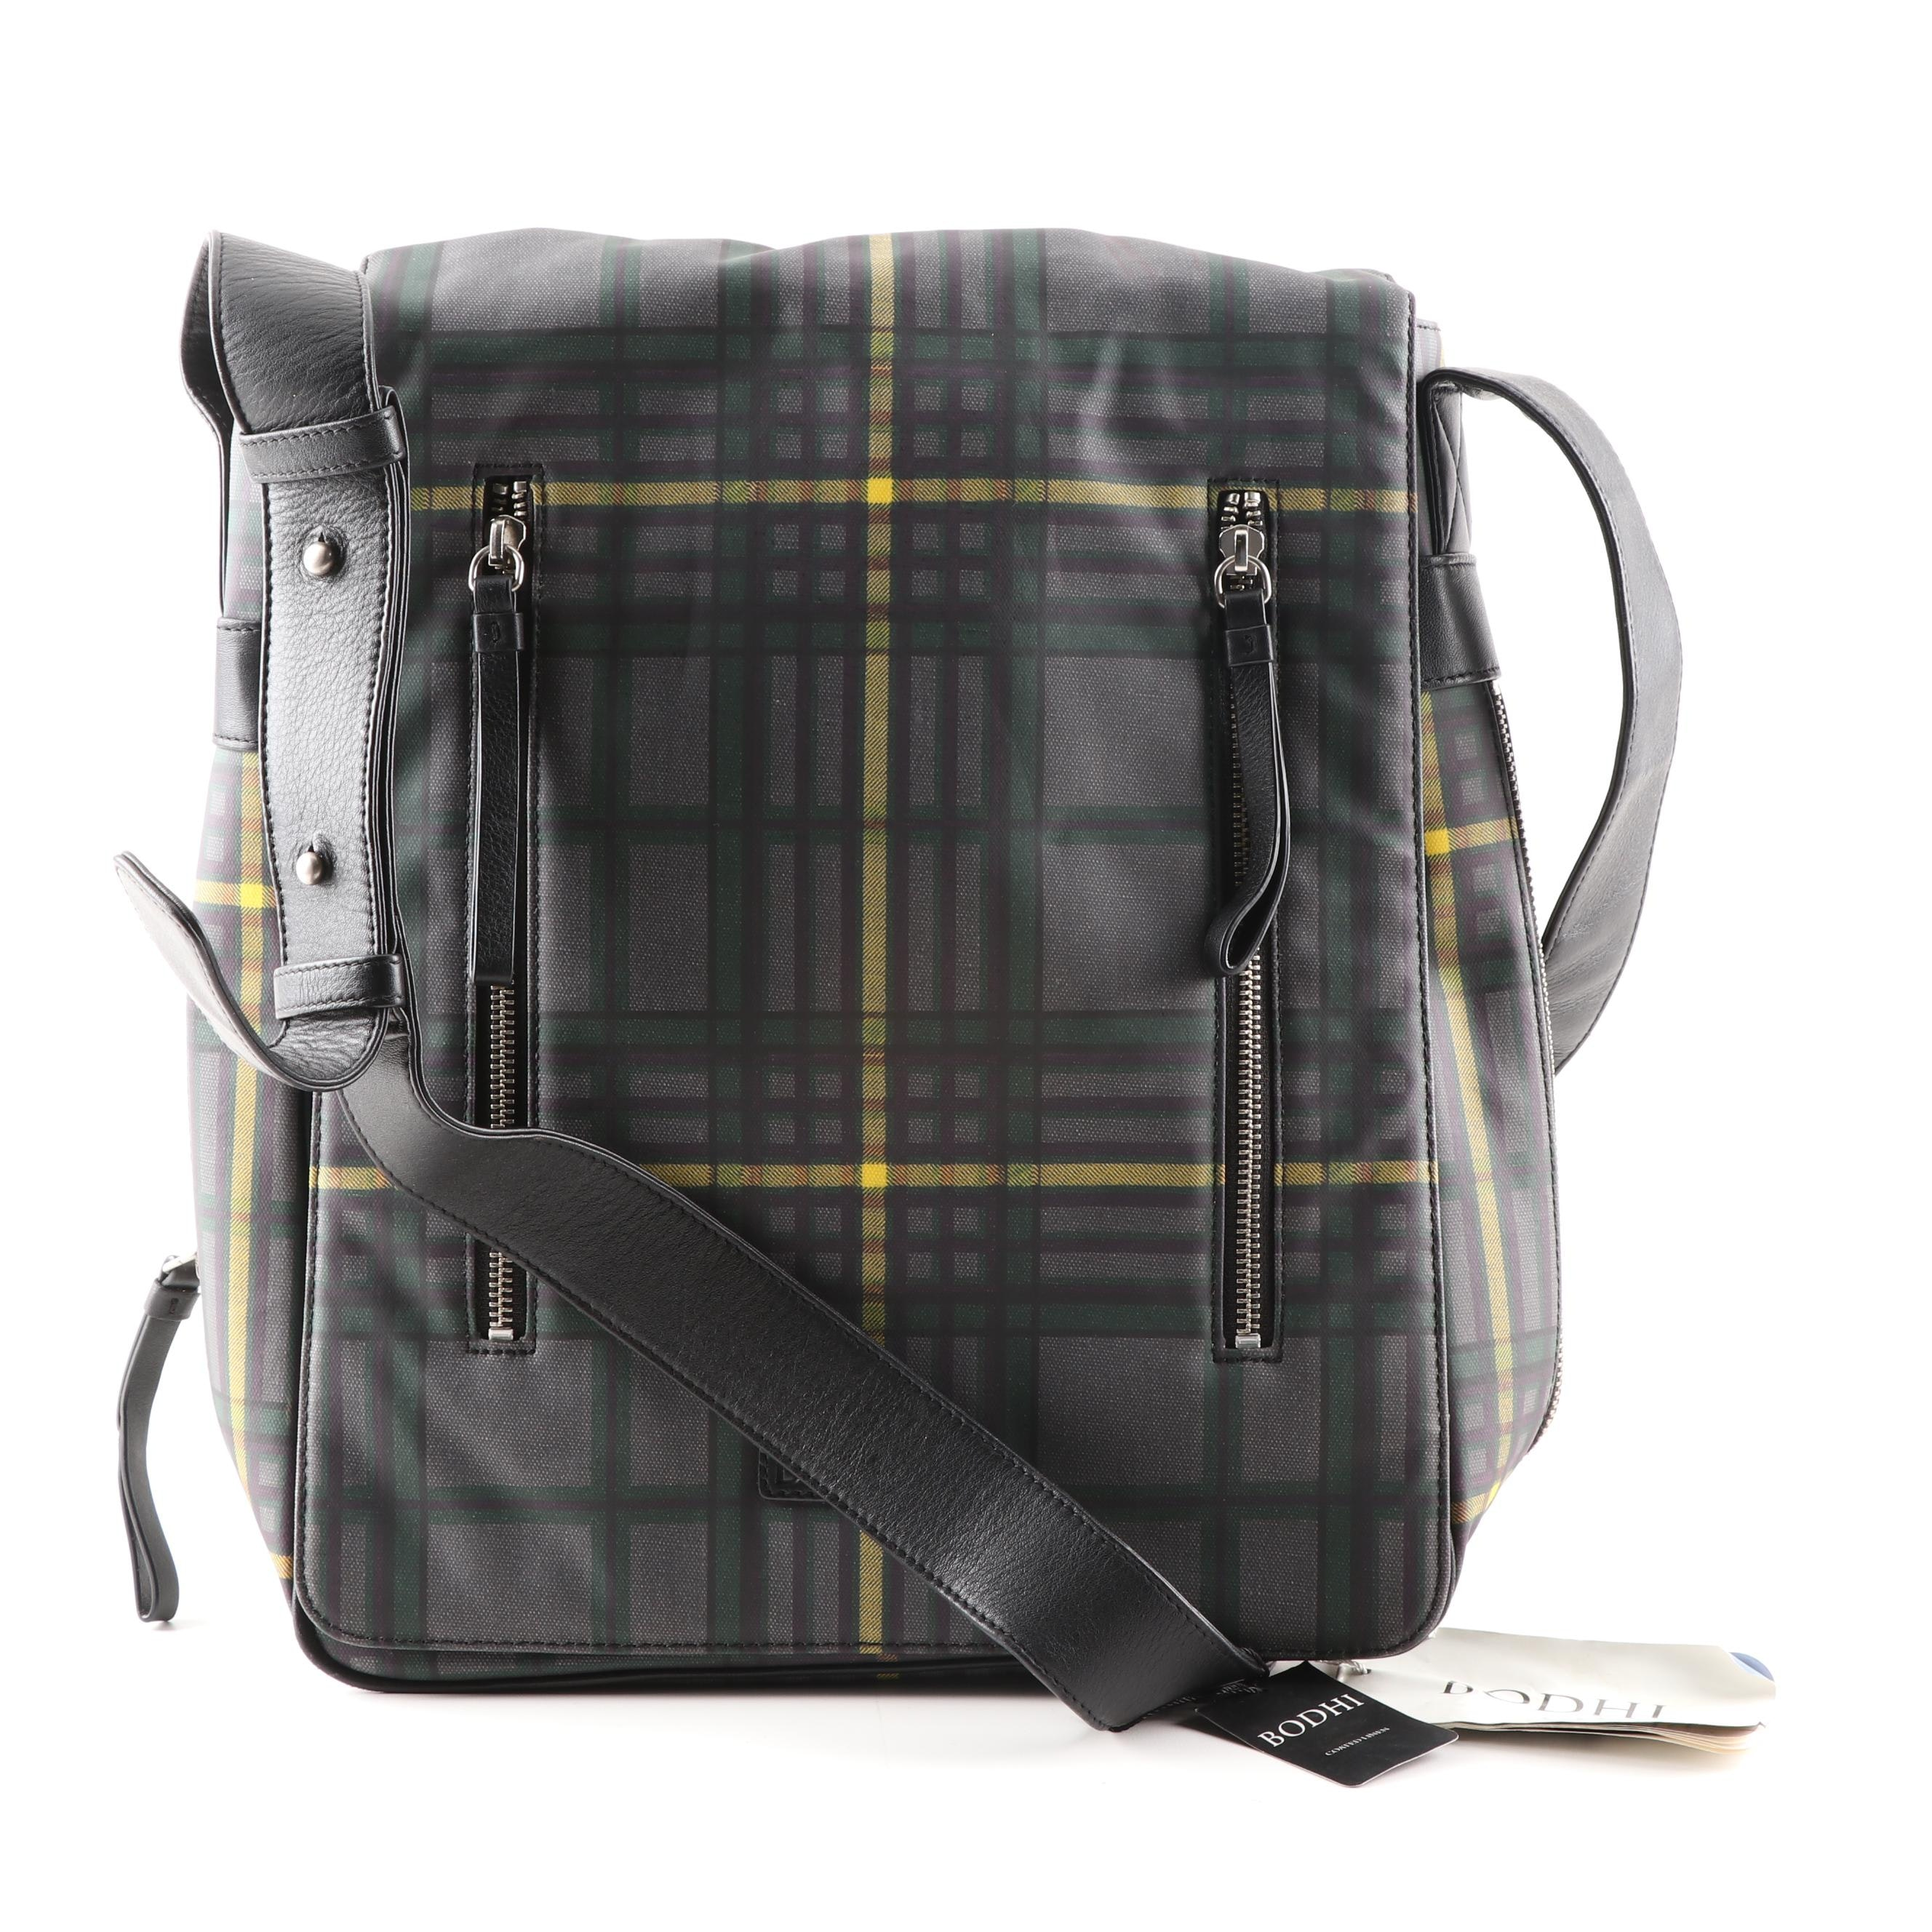 Bodhi Plaid Canvas and Black Leather Laptop Crossbody Bag